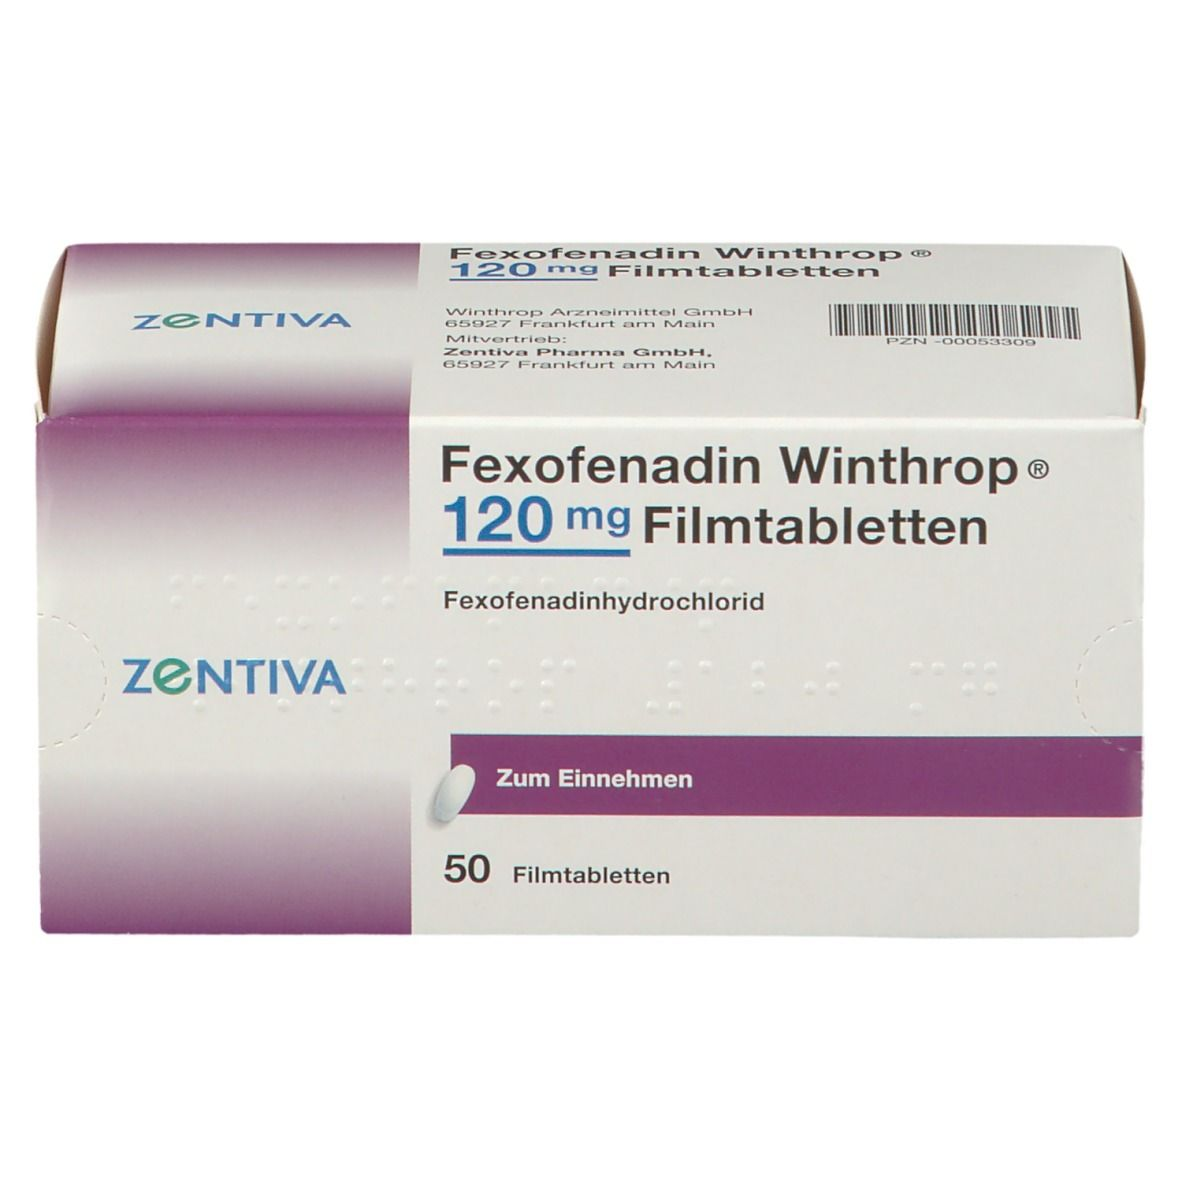 FEXOFENADIN Winthrop 120 mg